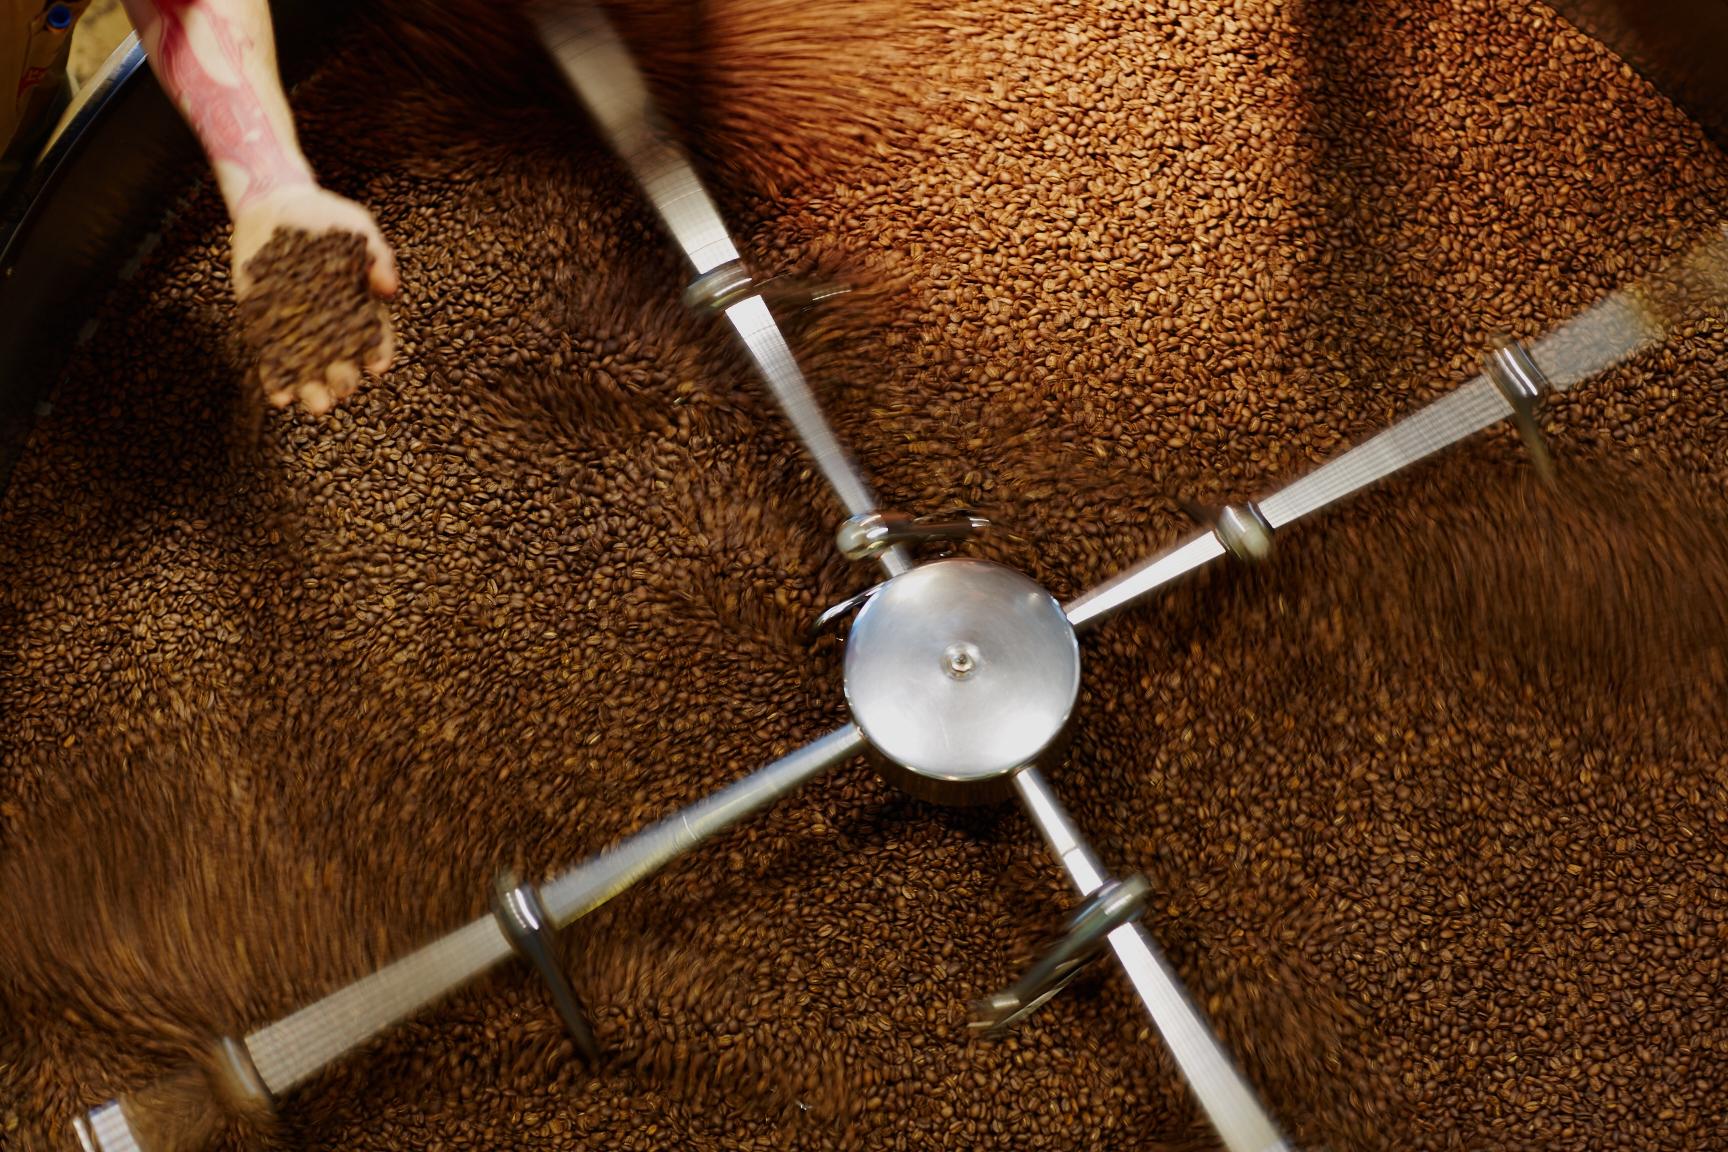 COFFEESUBSCRIPTION -